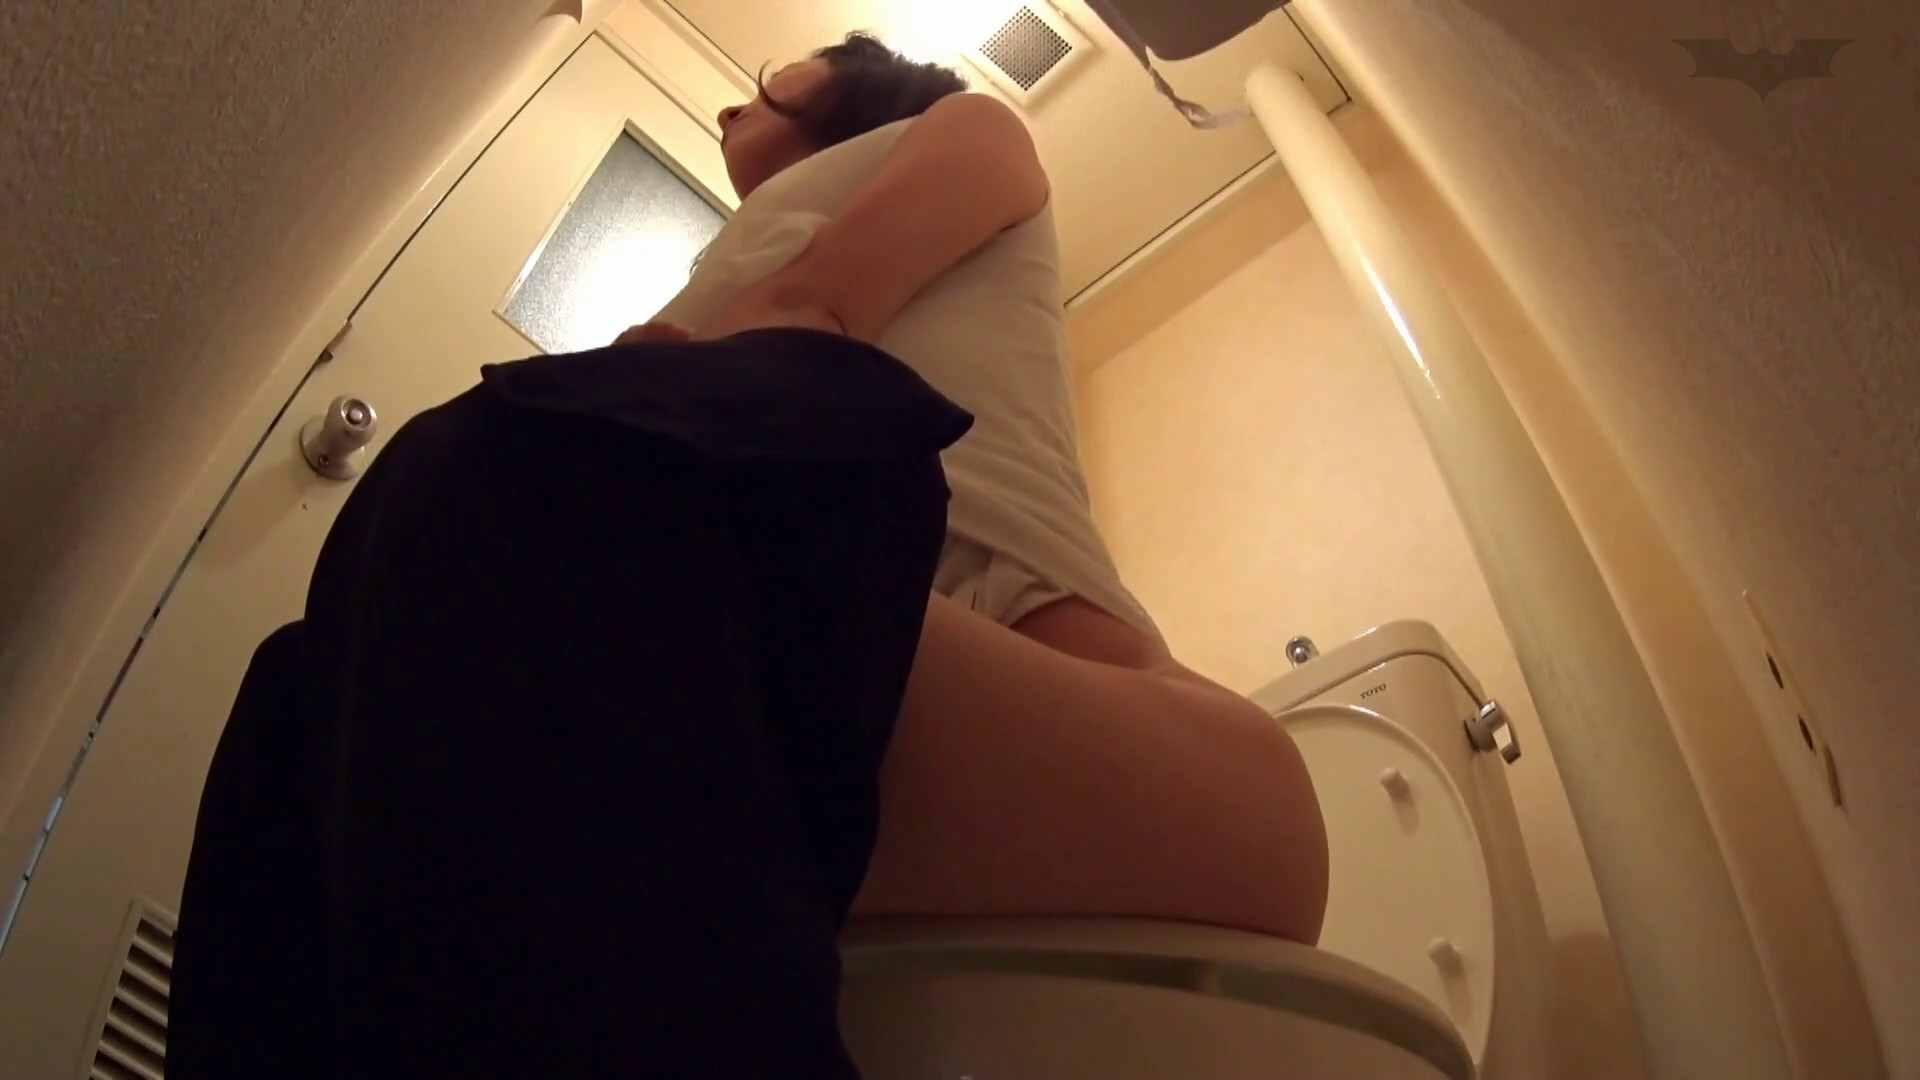 vol.04[洗面所]実はコレが目的でした。-脱糞美人お女市さまと巨乳大学生- 洗面所 AV動画キャプチャ 104画像 76